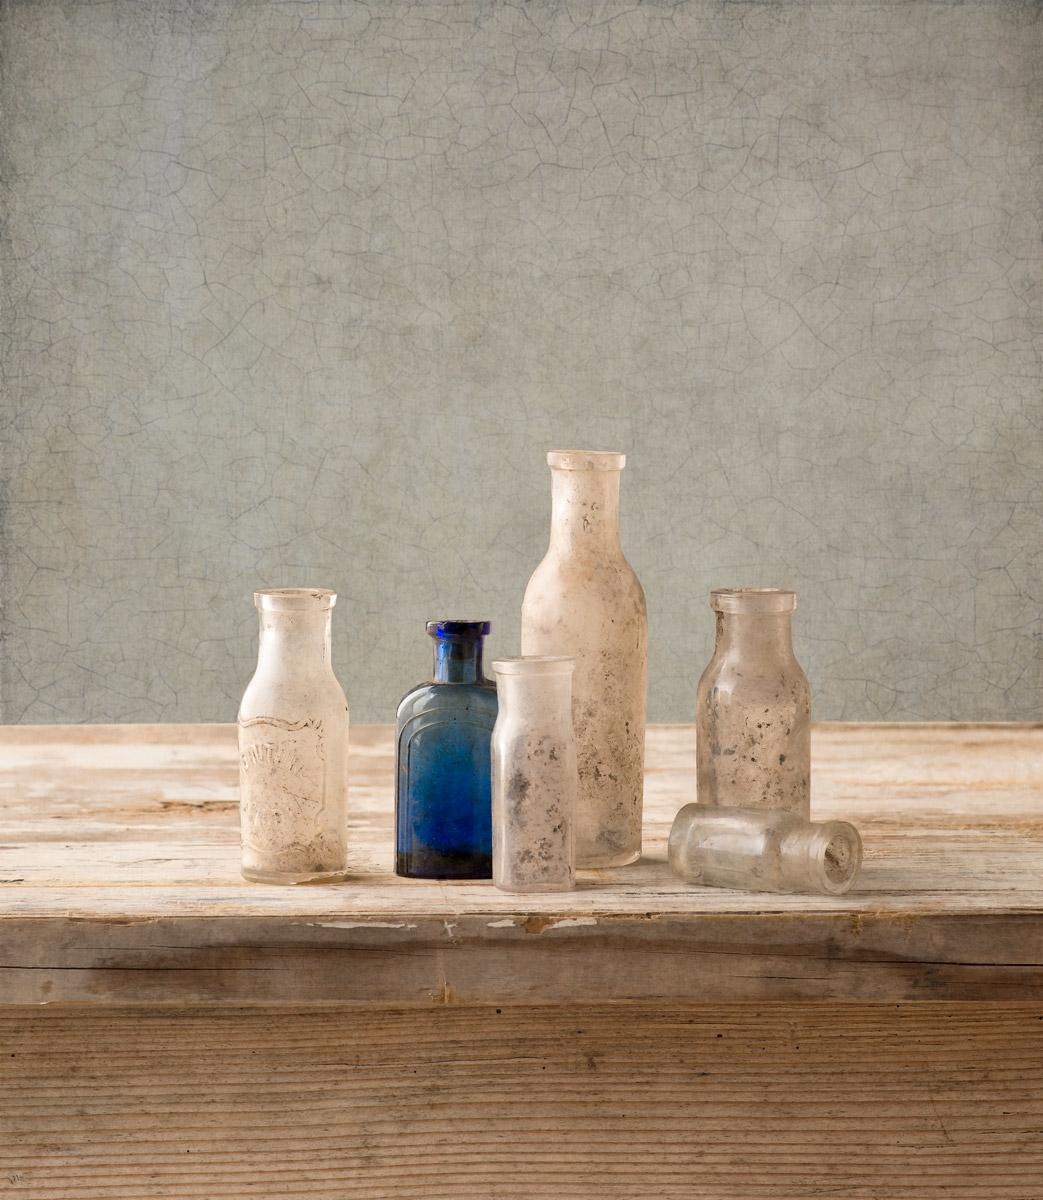 Teinture - vintage, french, bottles - tinekestoffels | ello